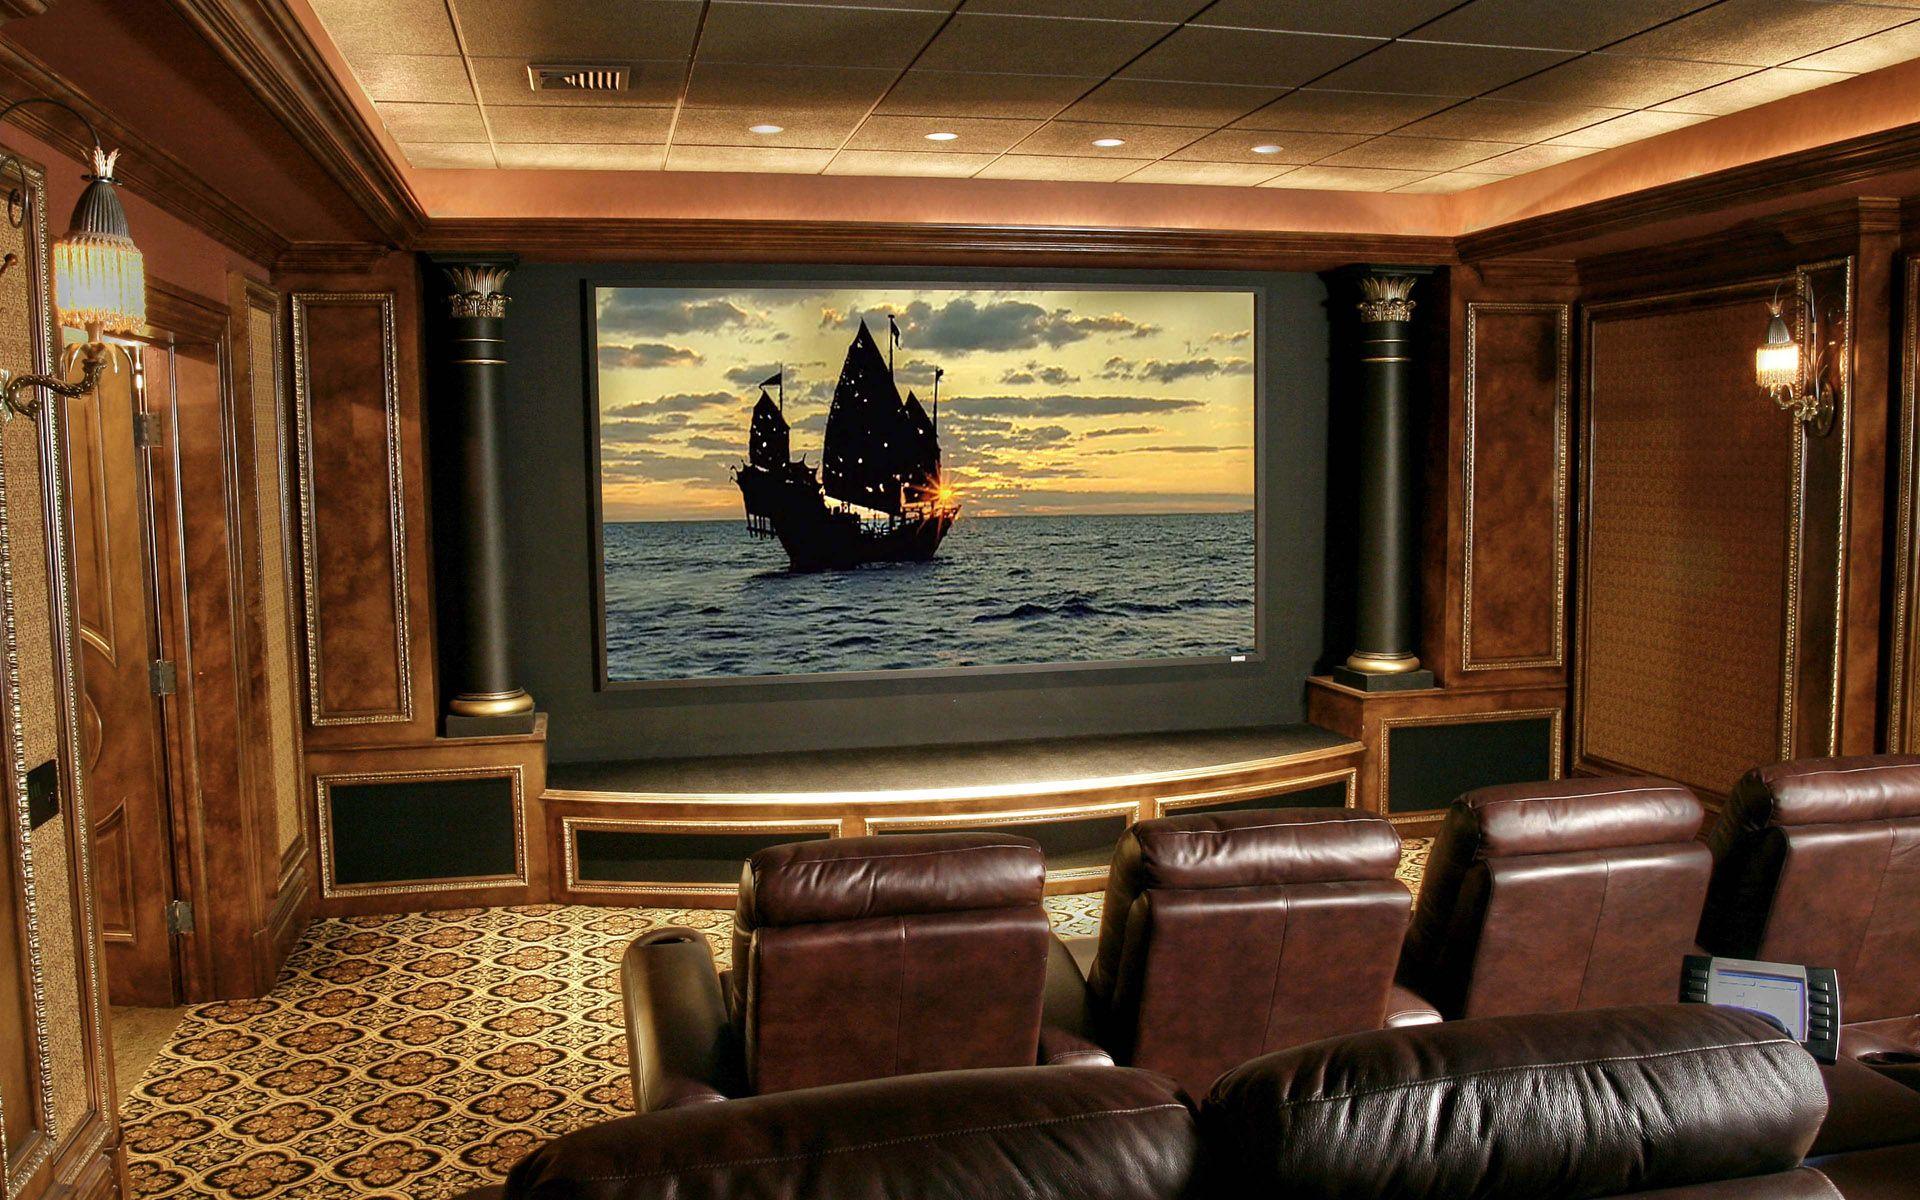 Amazing Luxury Home Theatre Design Ideas